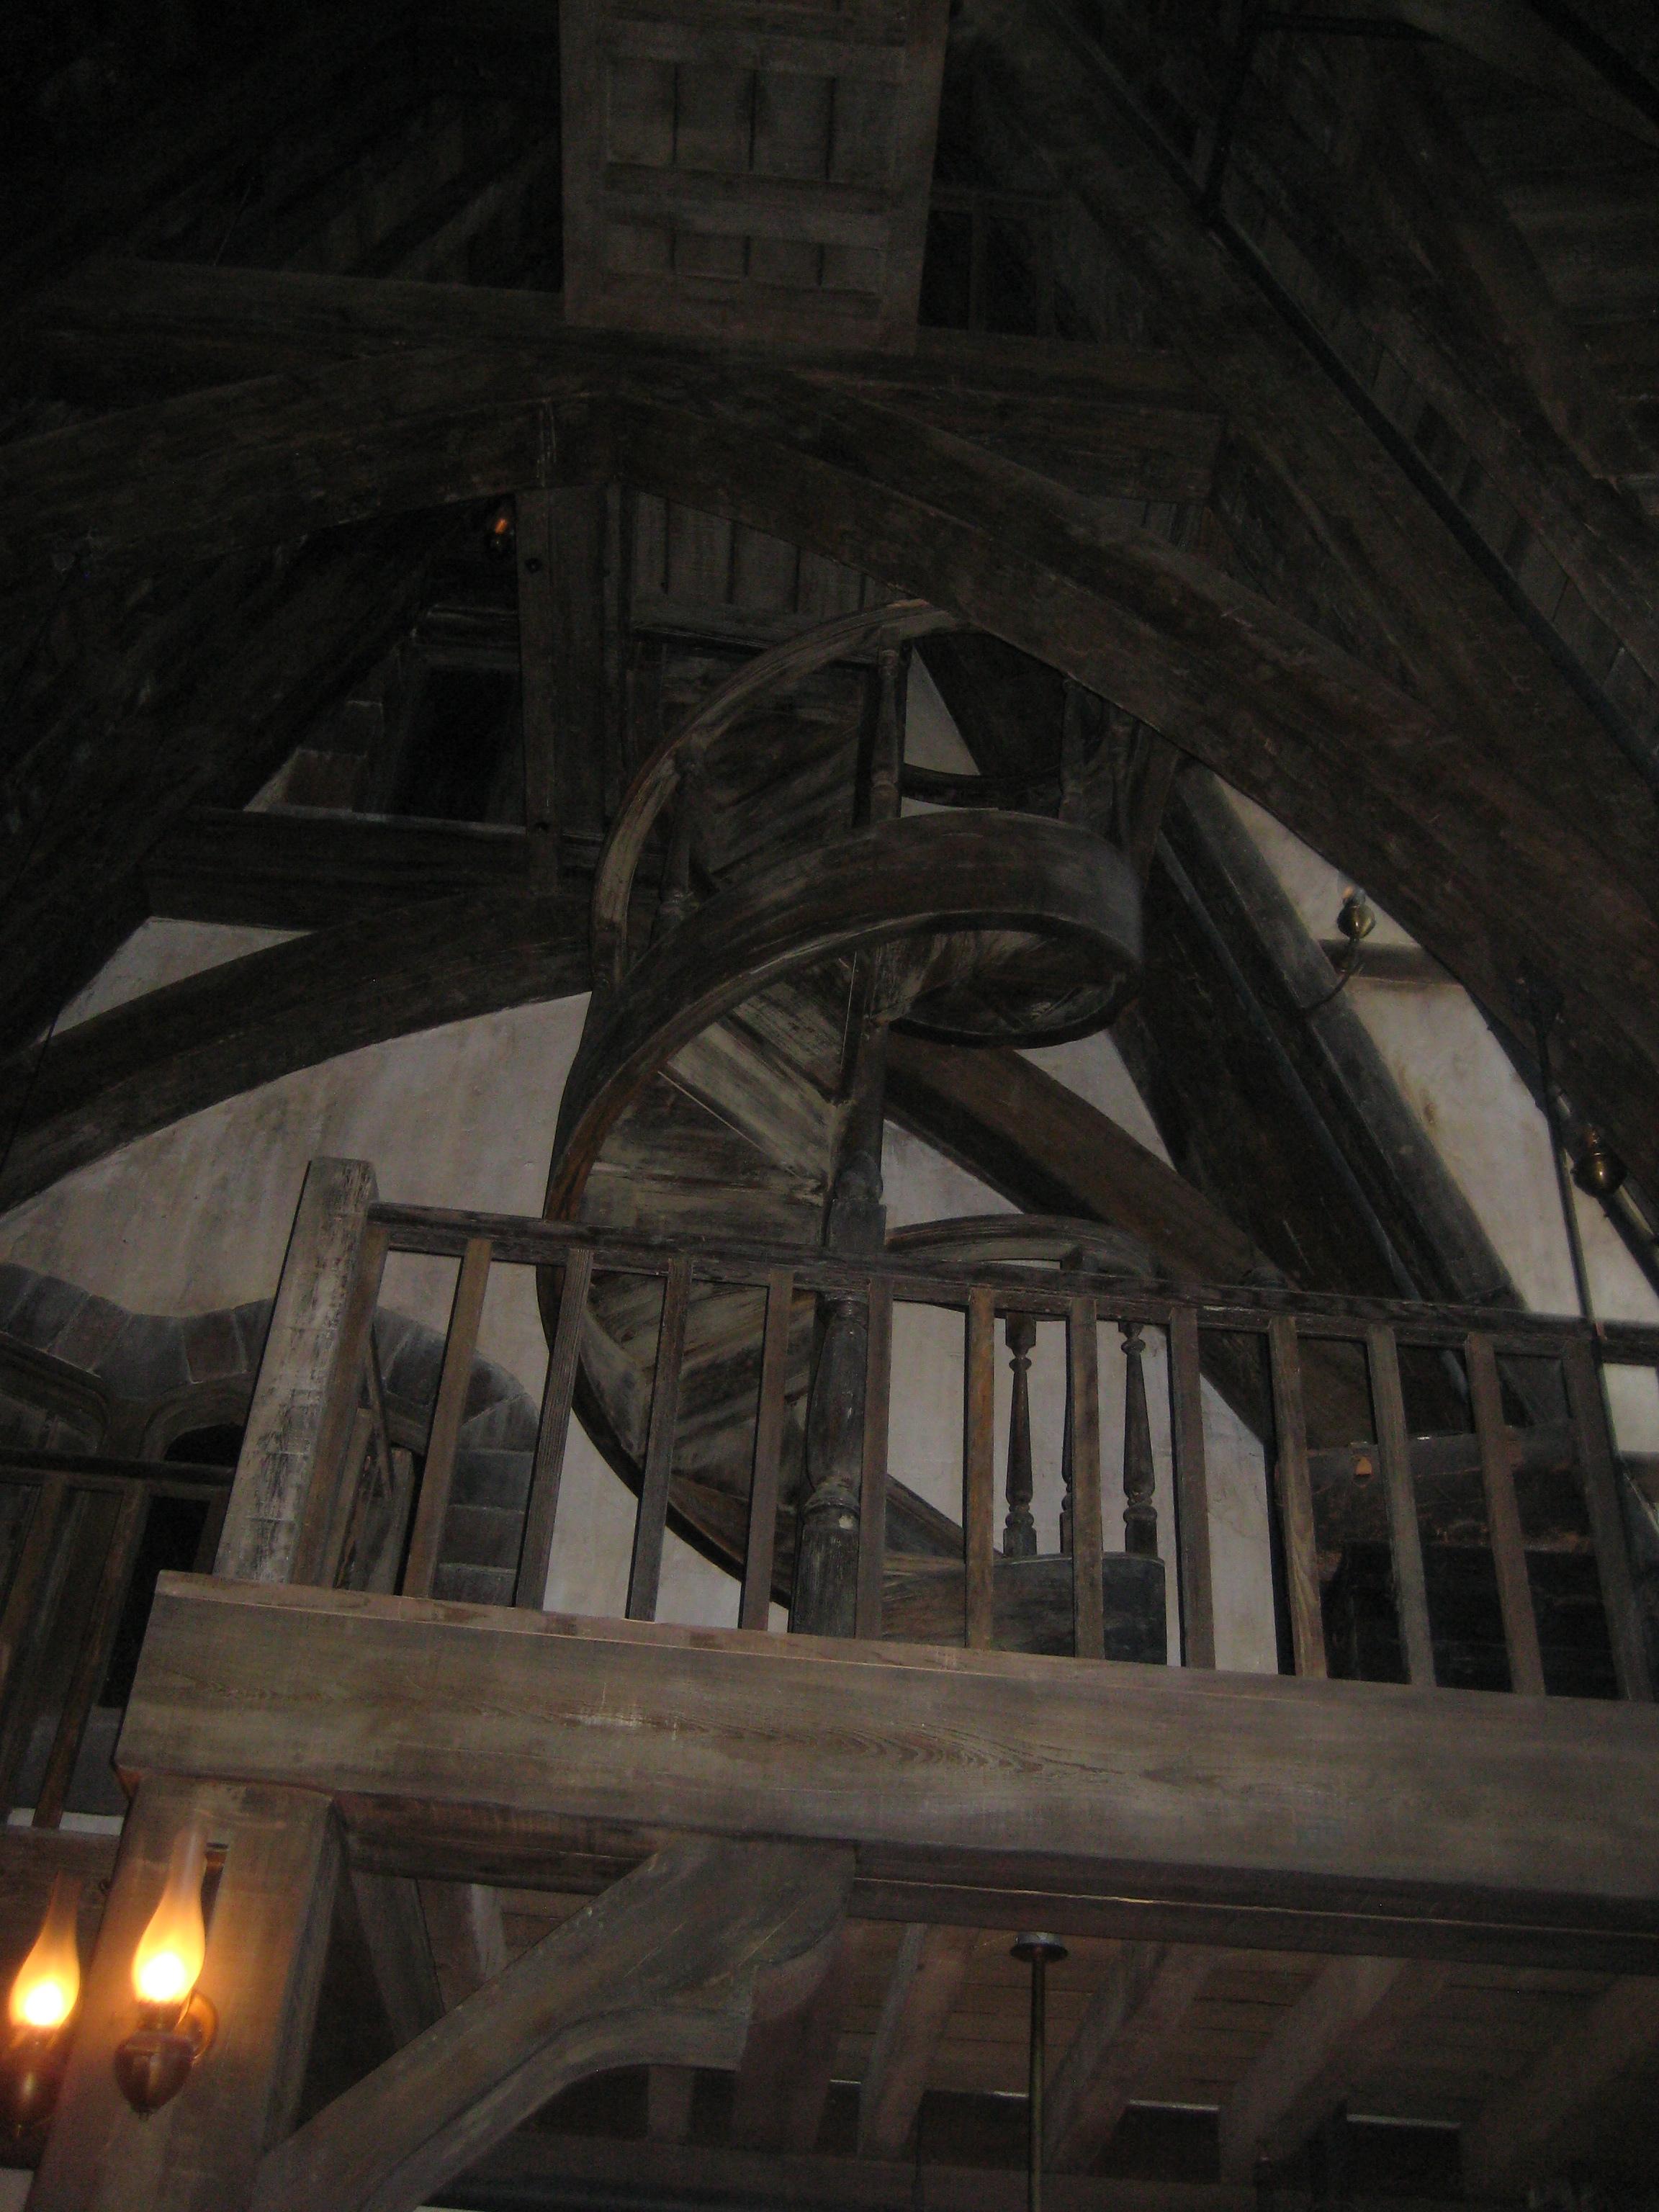 Inside the Three Broomsticks